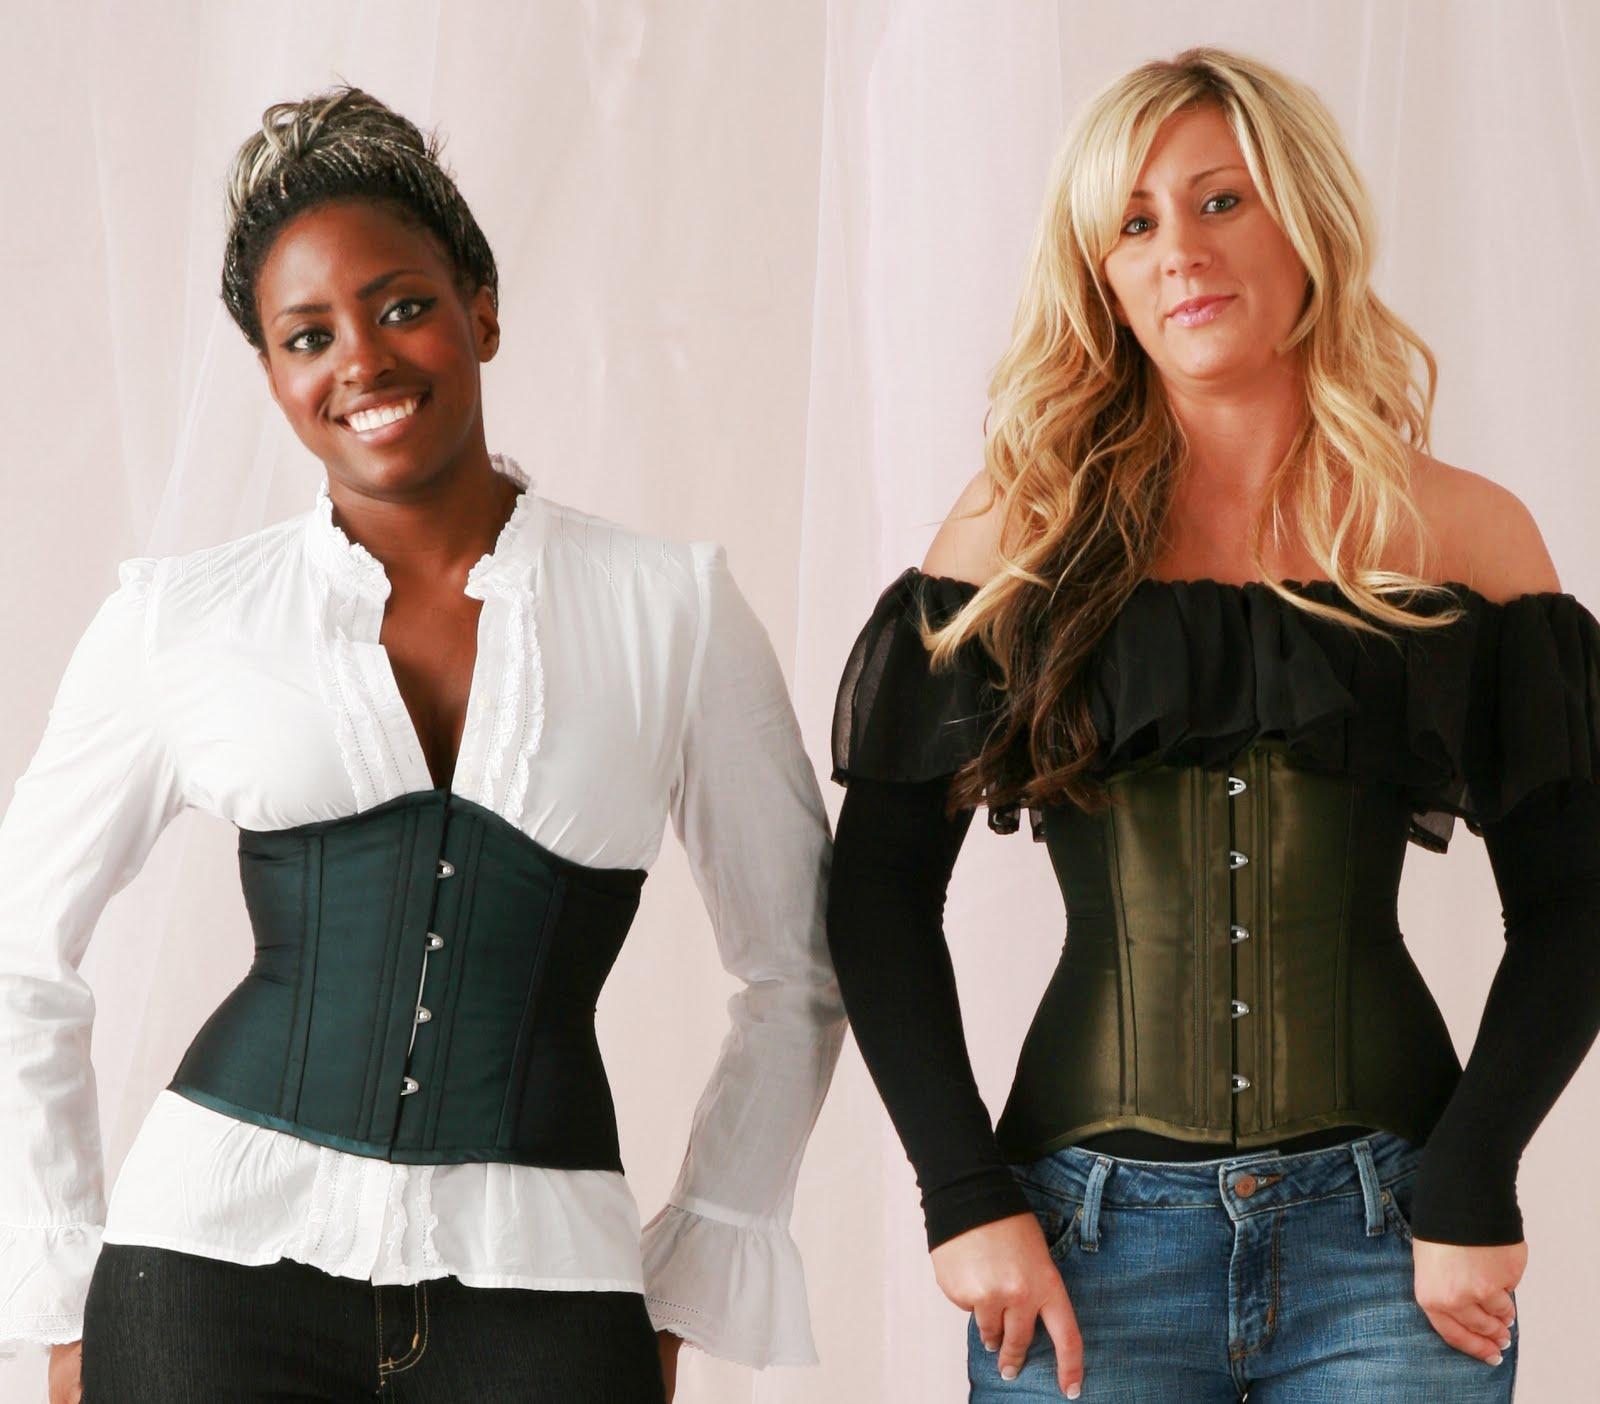 Farthingales Corset blog: Corset Fashion Show